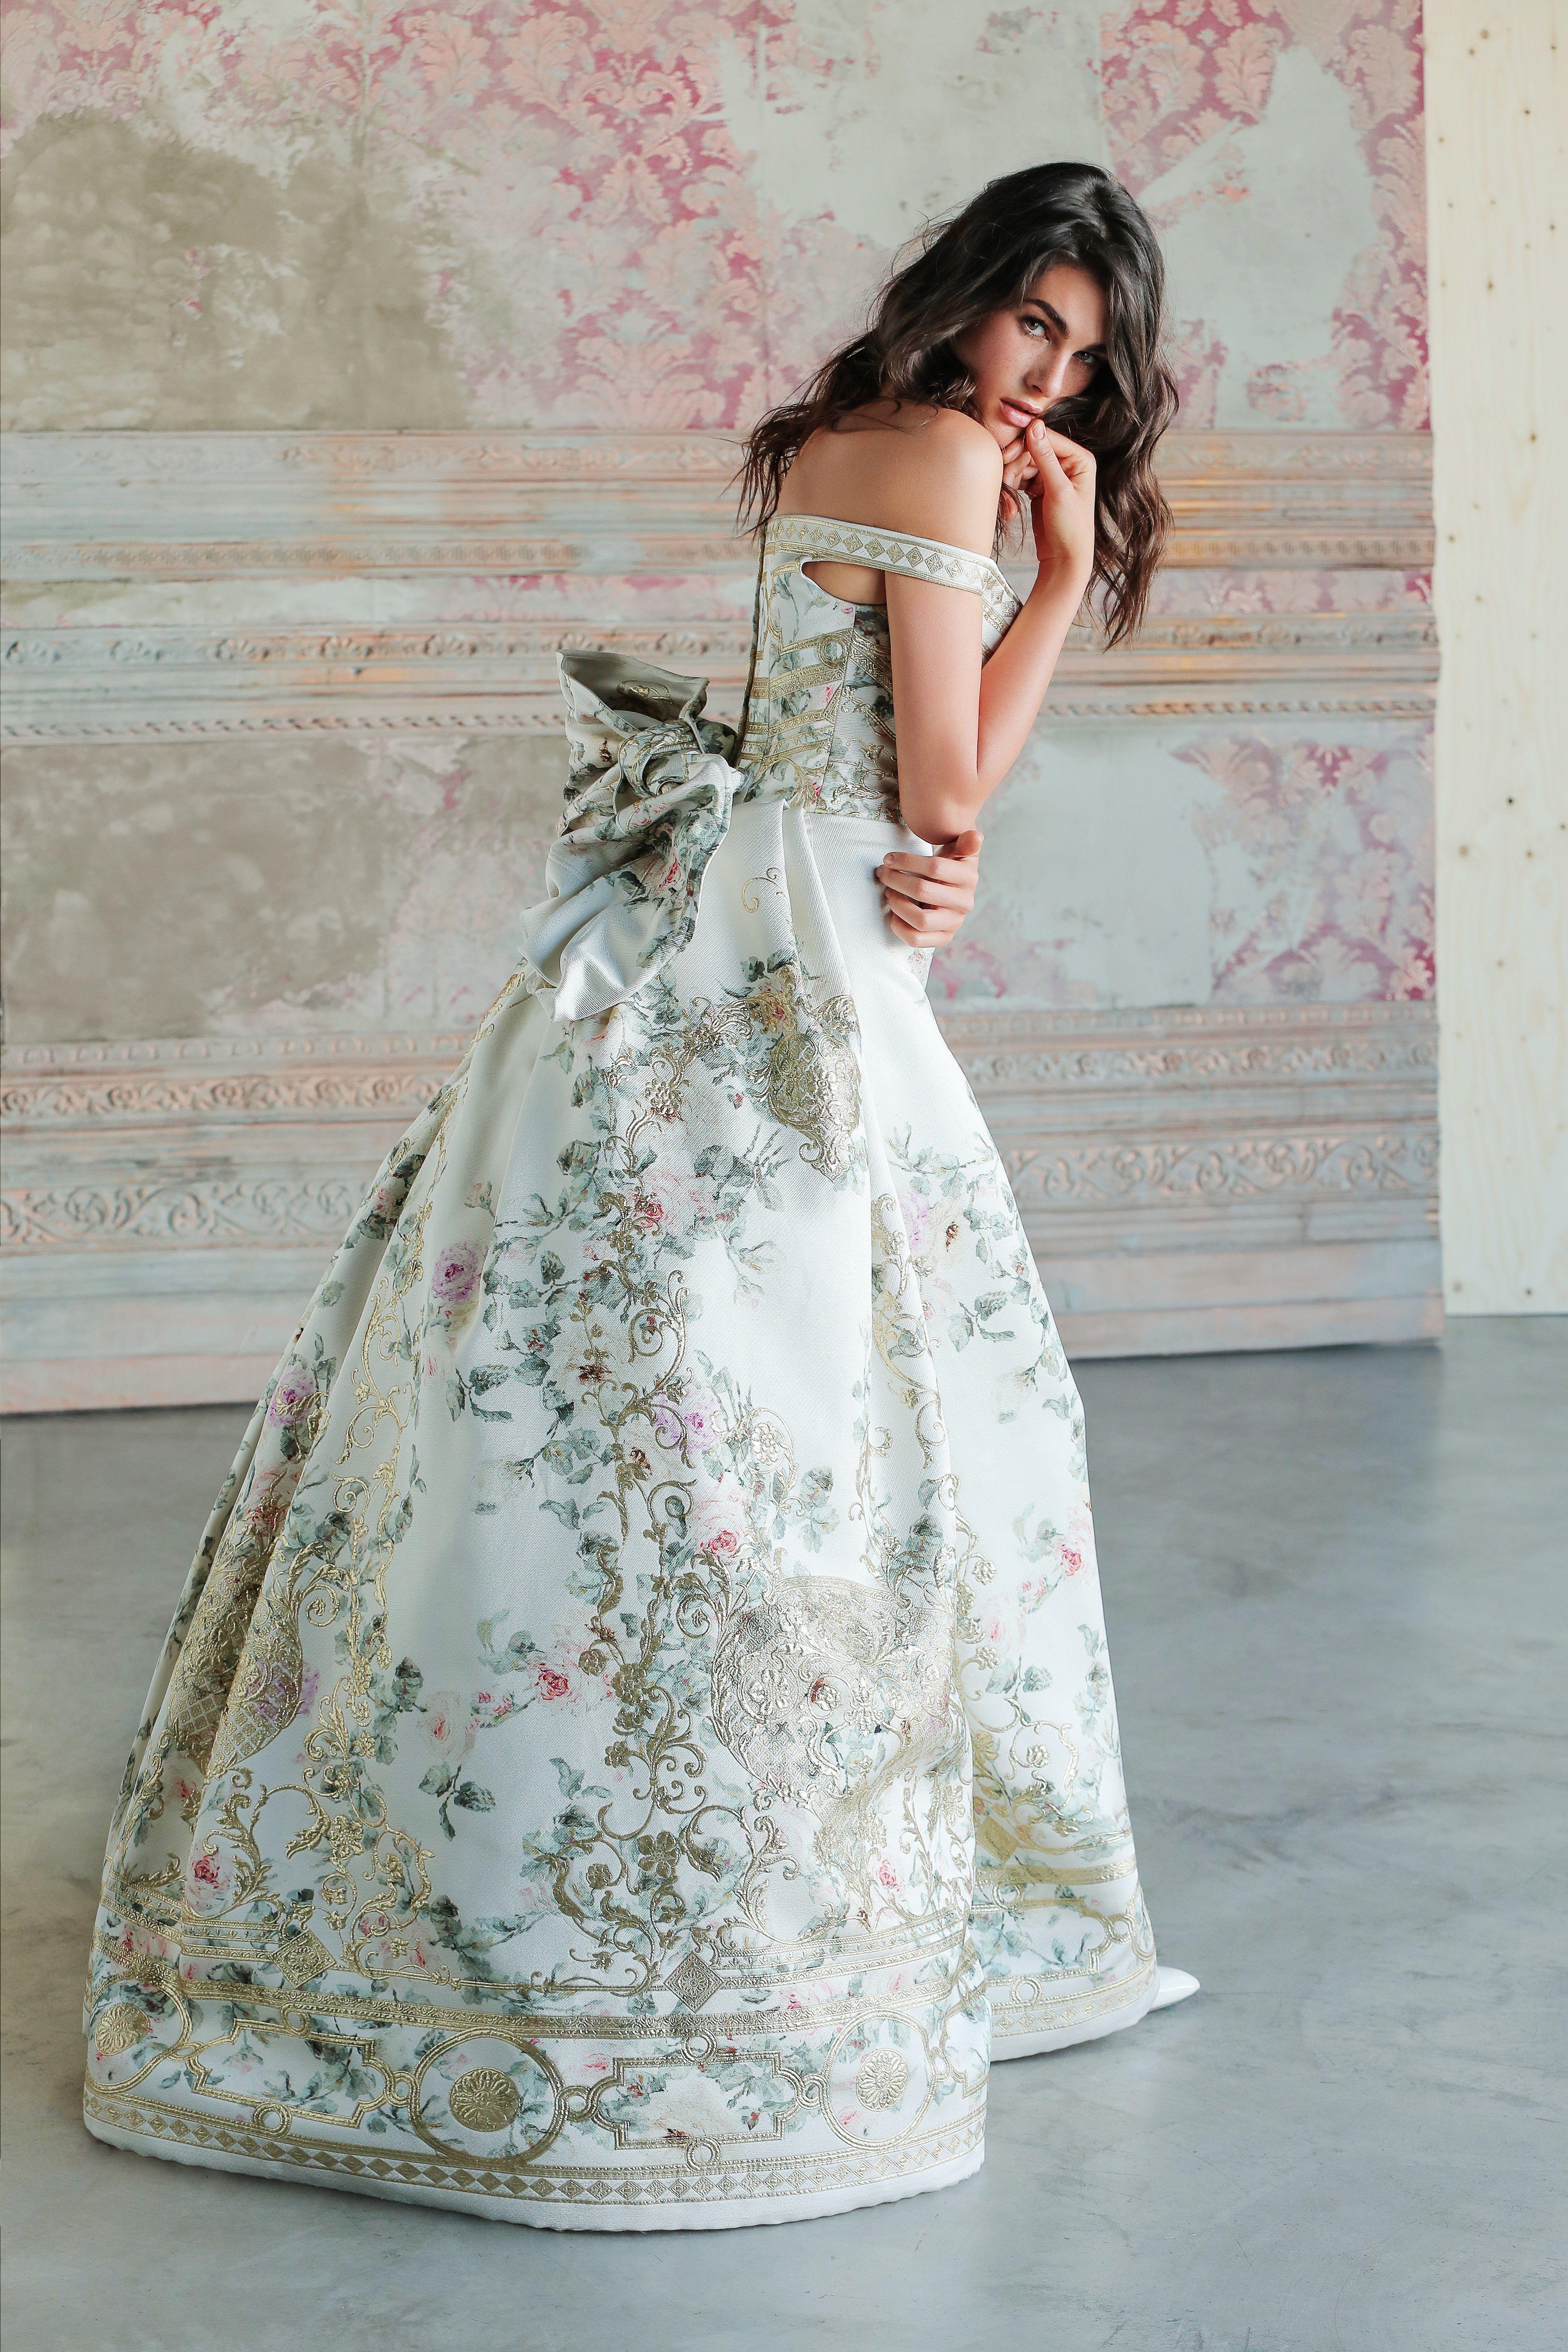 Antonio Riva Bridal   Wedding Dress Collection Spring 2019  bfa25d3d0d5